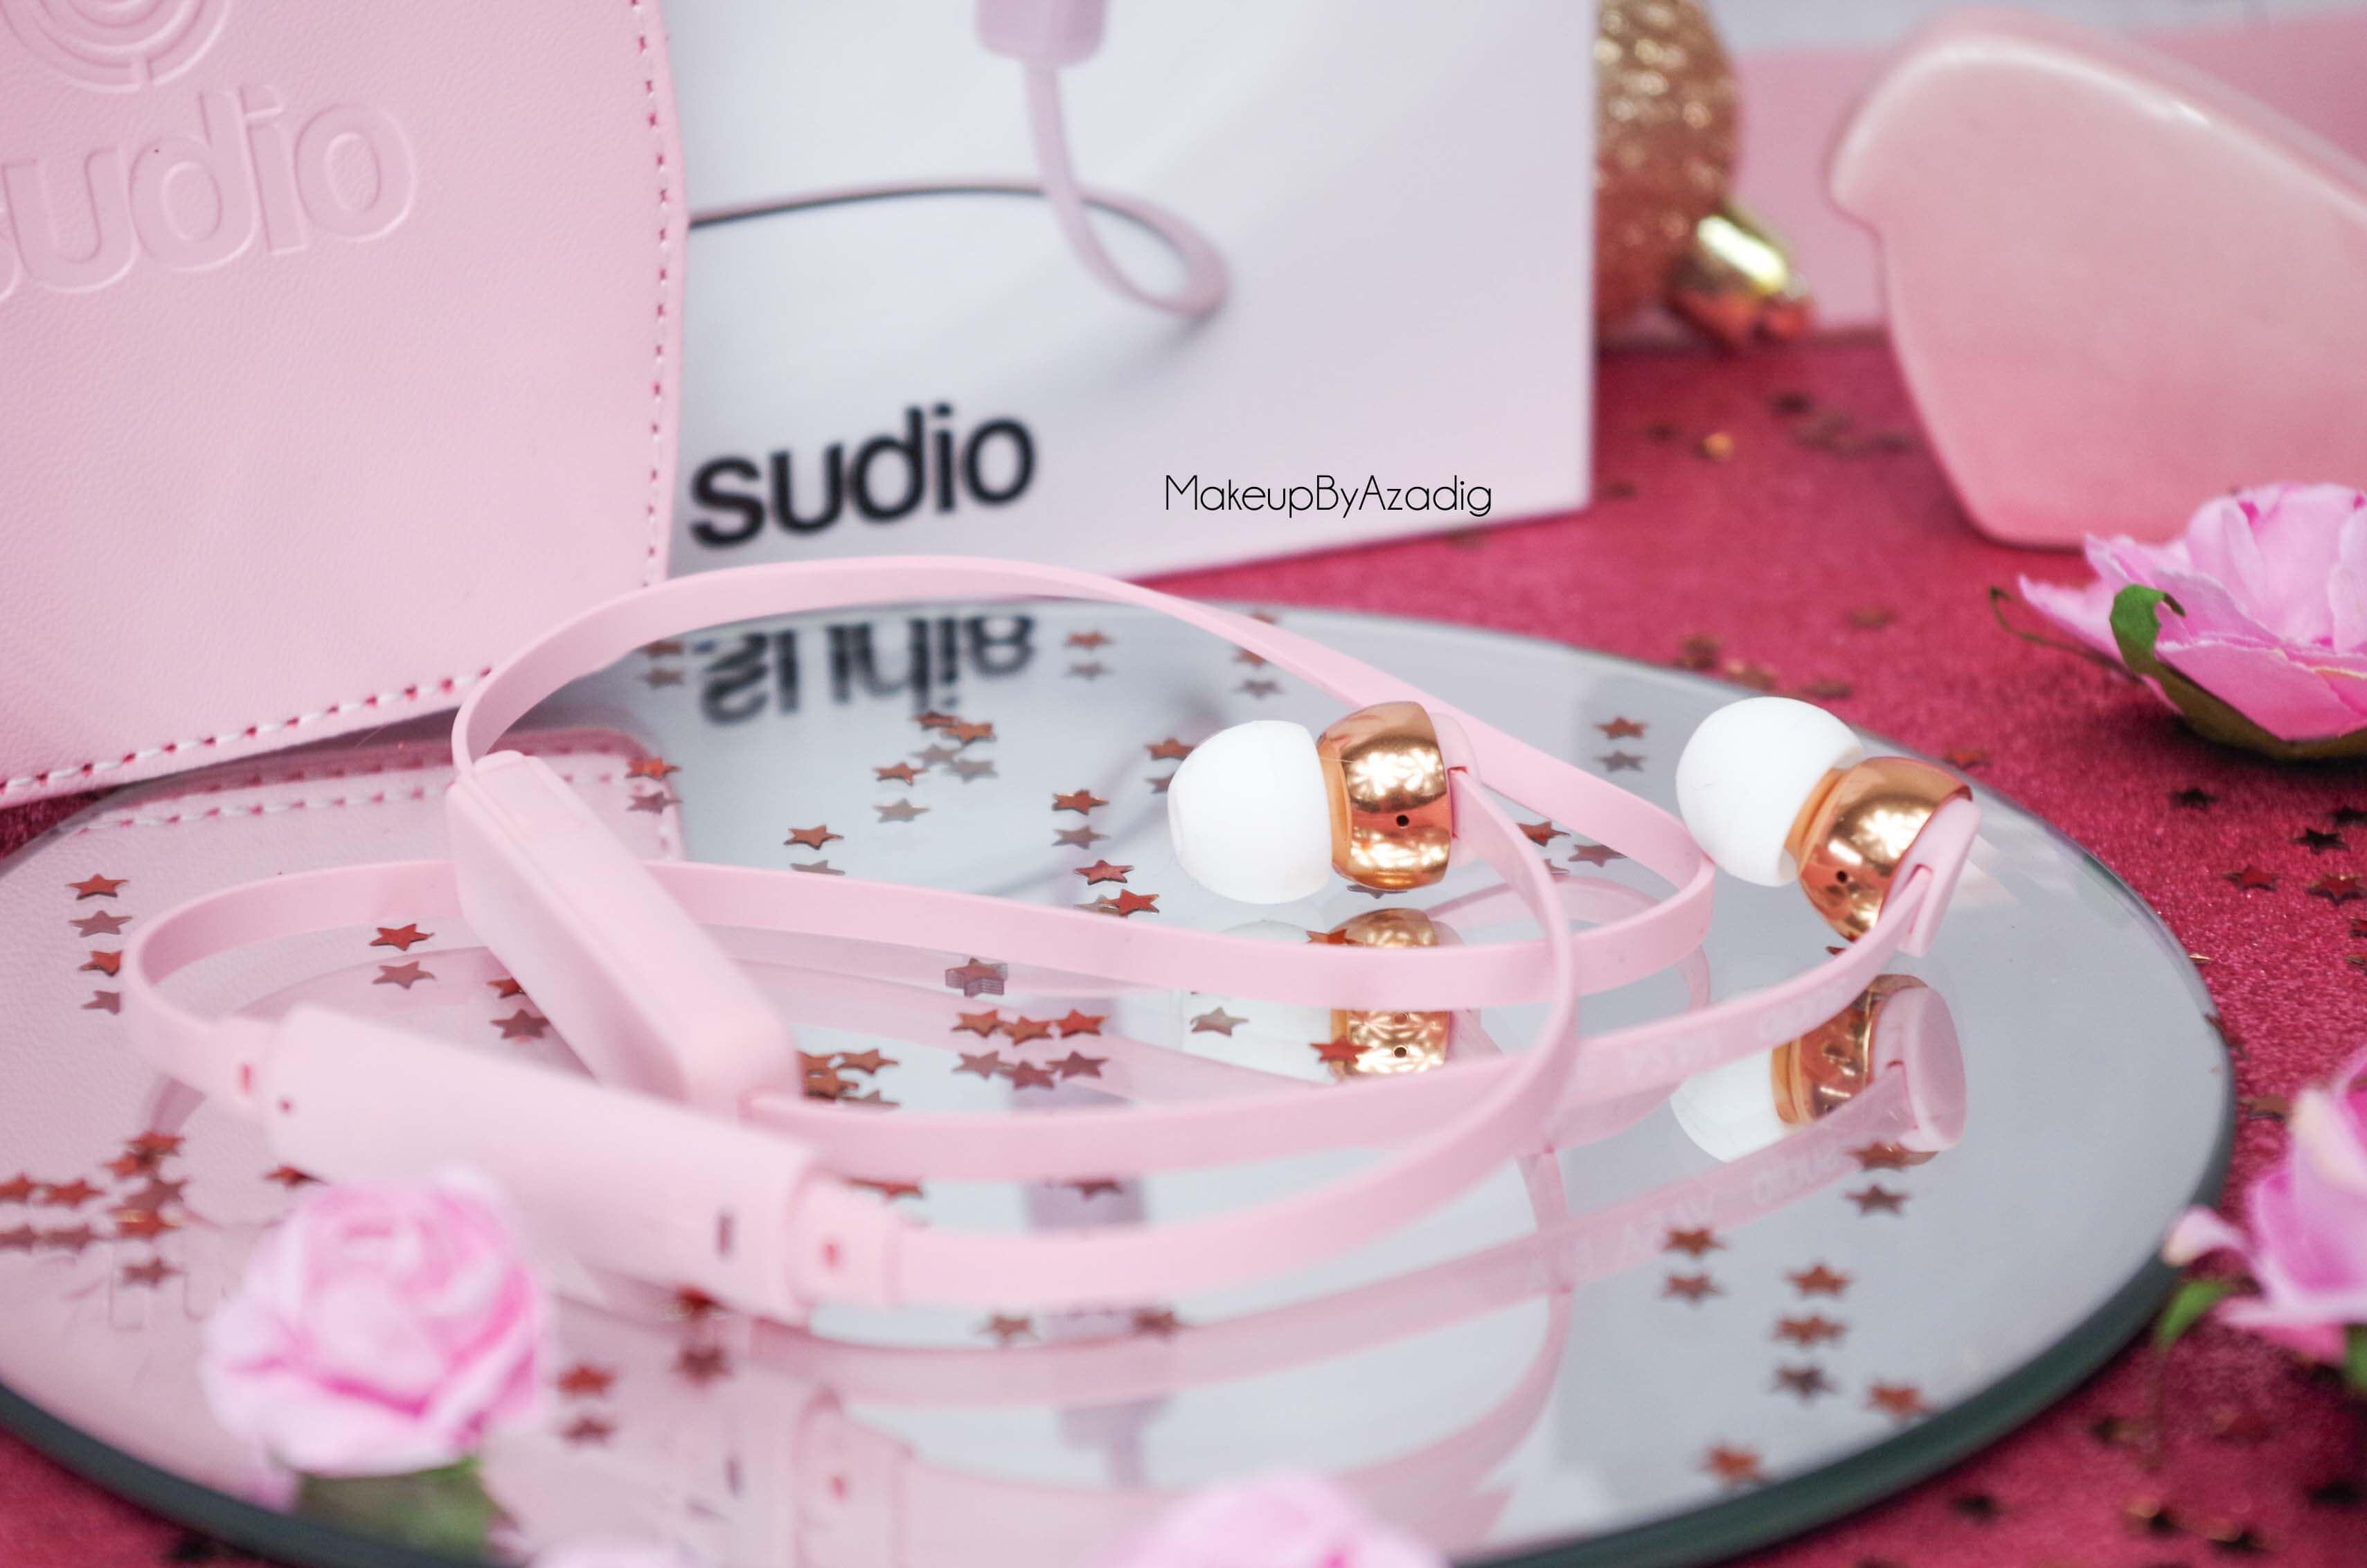 ecouteurs-casque-sans-fil-bluetooth-design-tendance-sudio-sweden-rose-vasa-bla-makeupbyazadig-avis